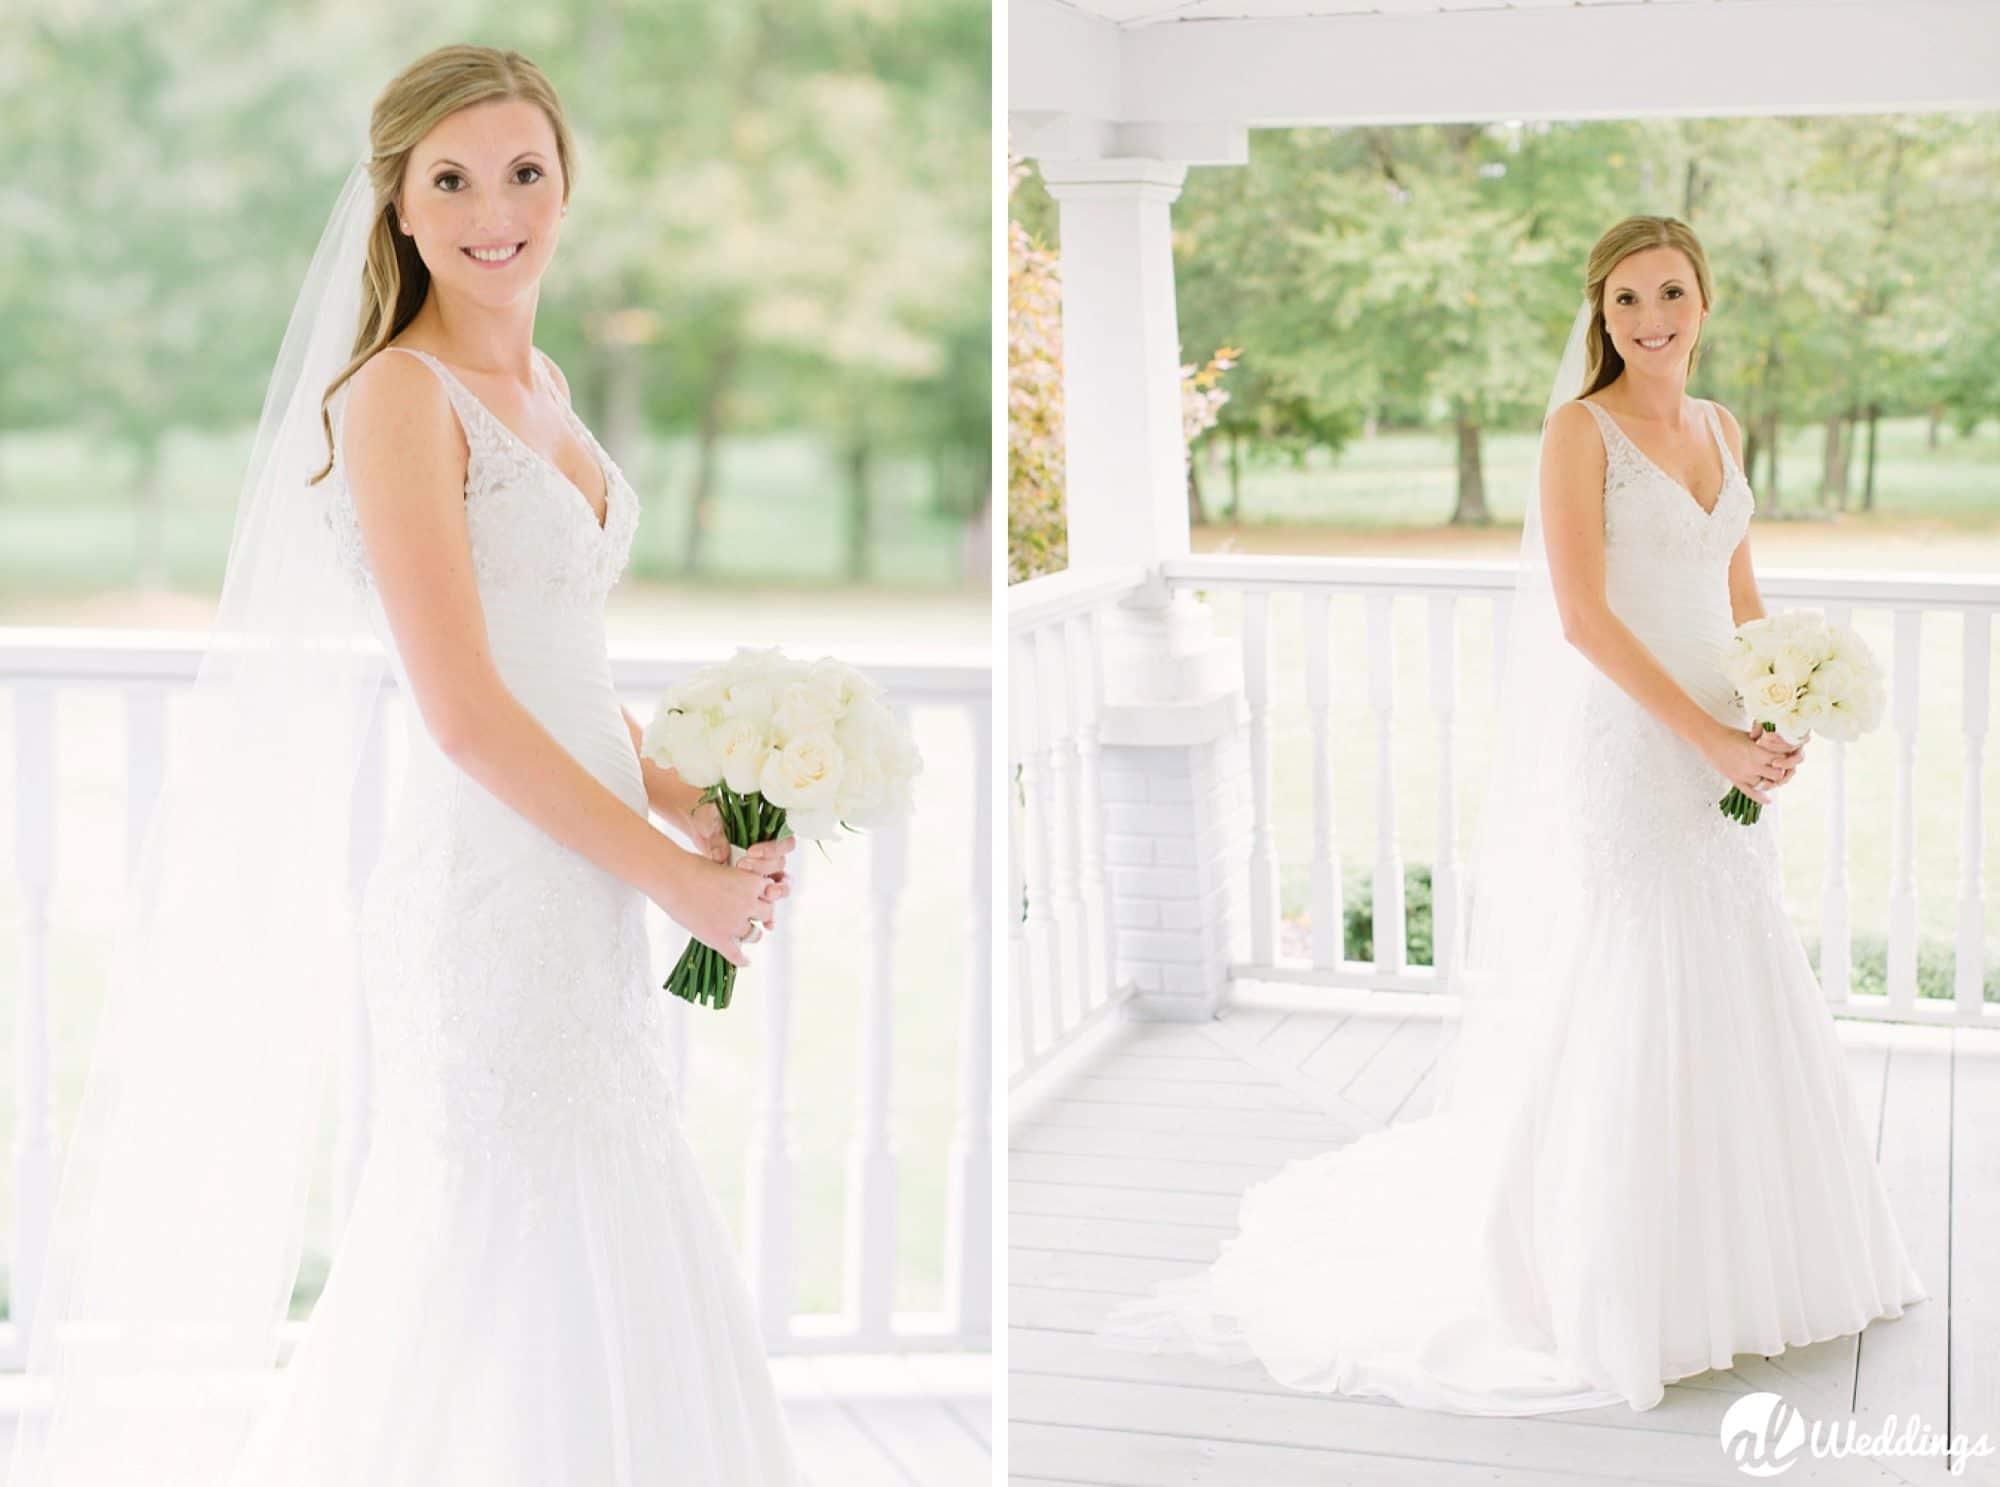 Brooke blake the sonnet house wedding al weddings for Abby brookes salon